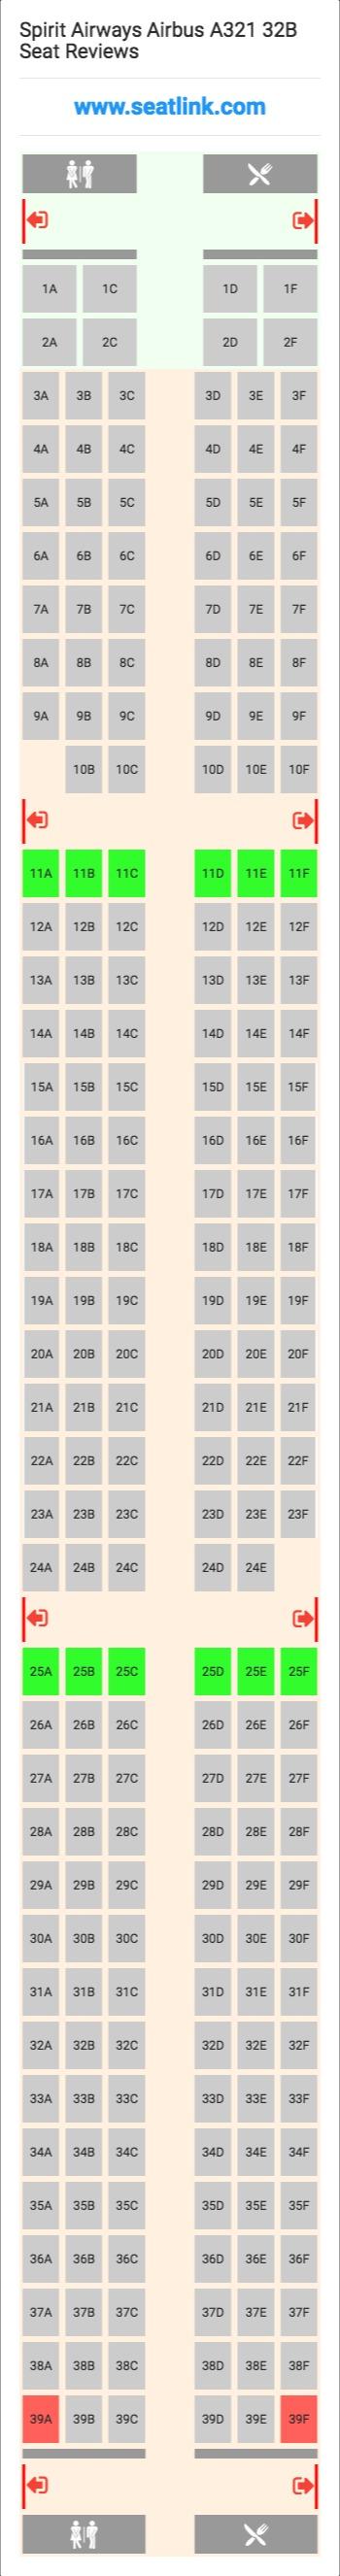 Spirit Airways Airbus A321 32B Seating Chart - Updated August 2019 ...